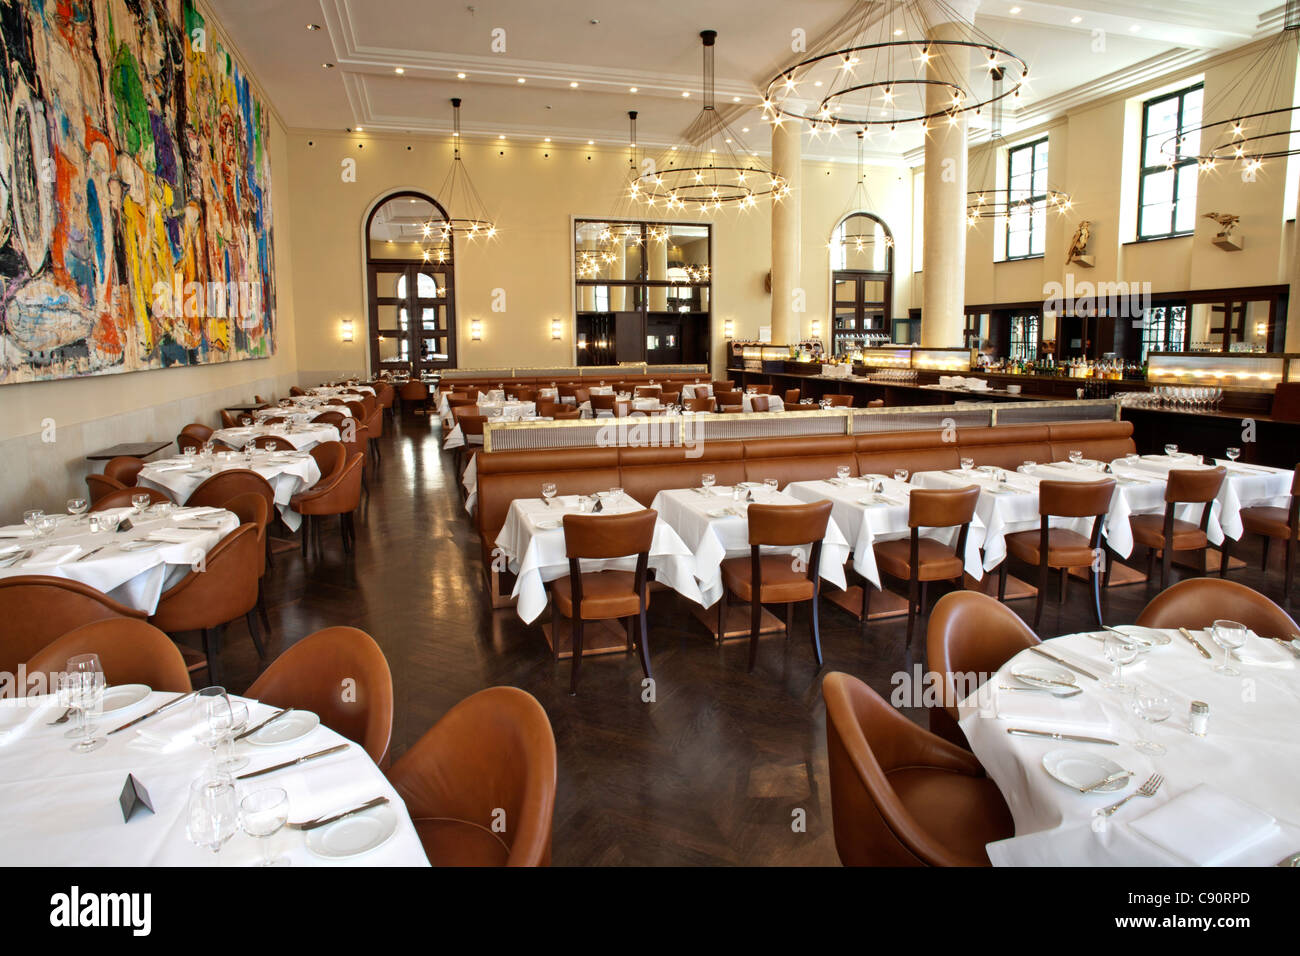 Gendarmerie restaurant, Berlin Mitte, Berlin, Germany - Stock Image